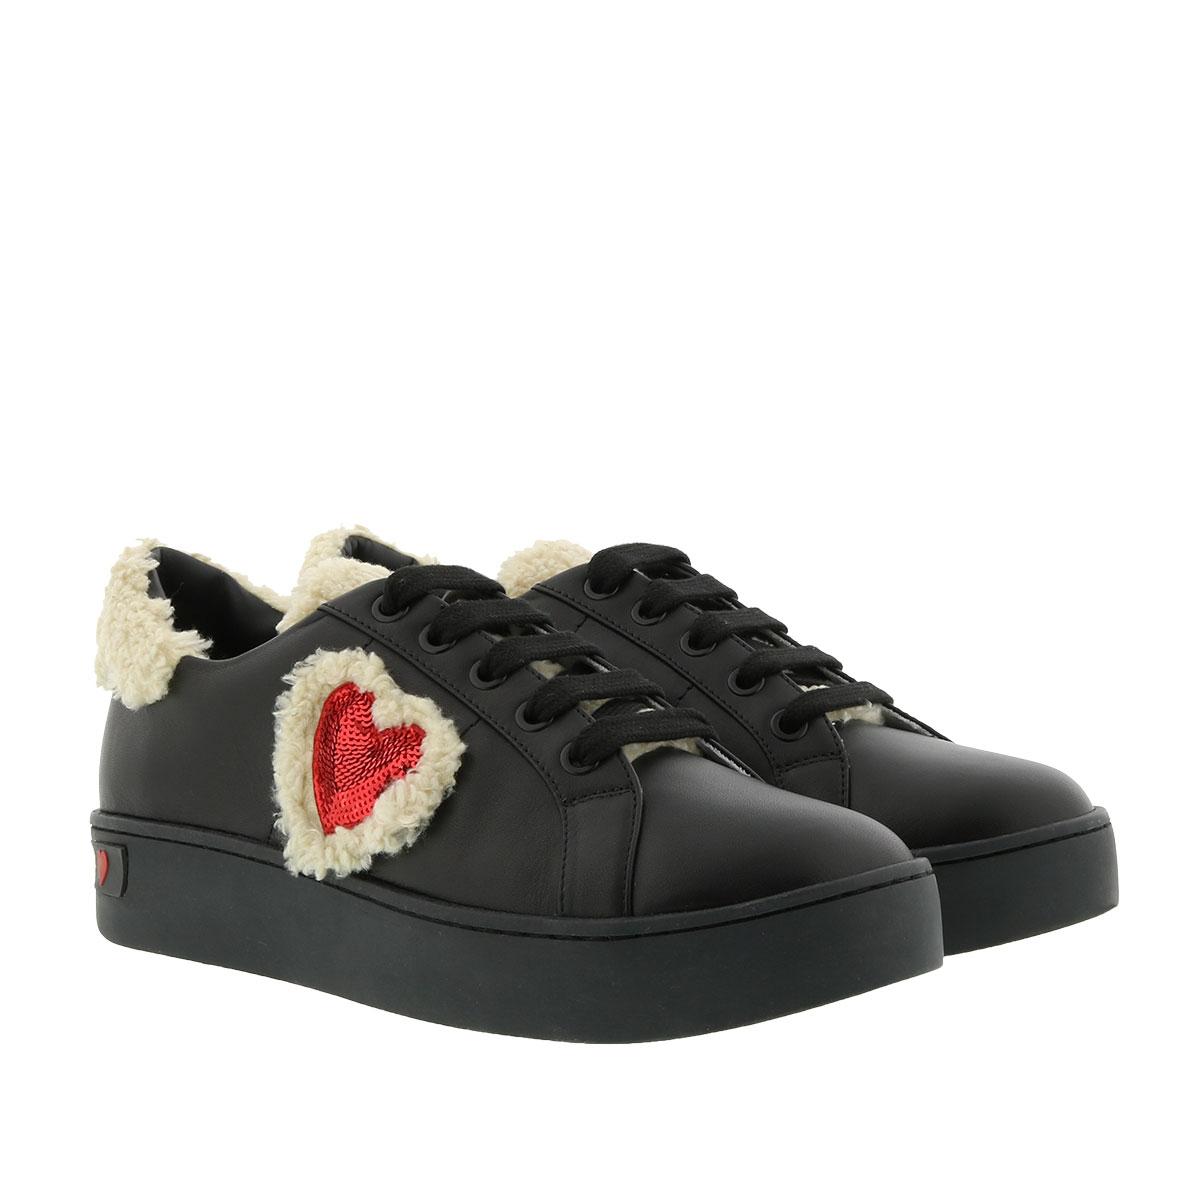 Love Moschino Sneakers - Sneaker Heart Nero - in schwarz - für Damen